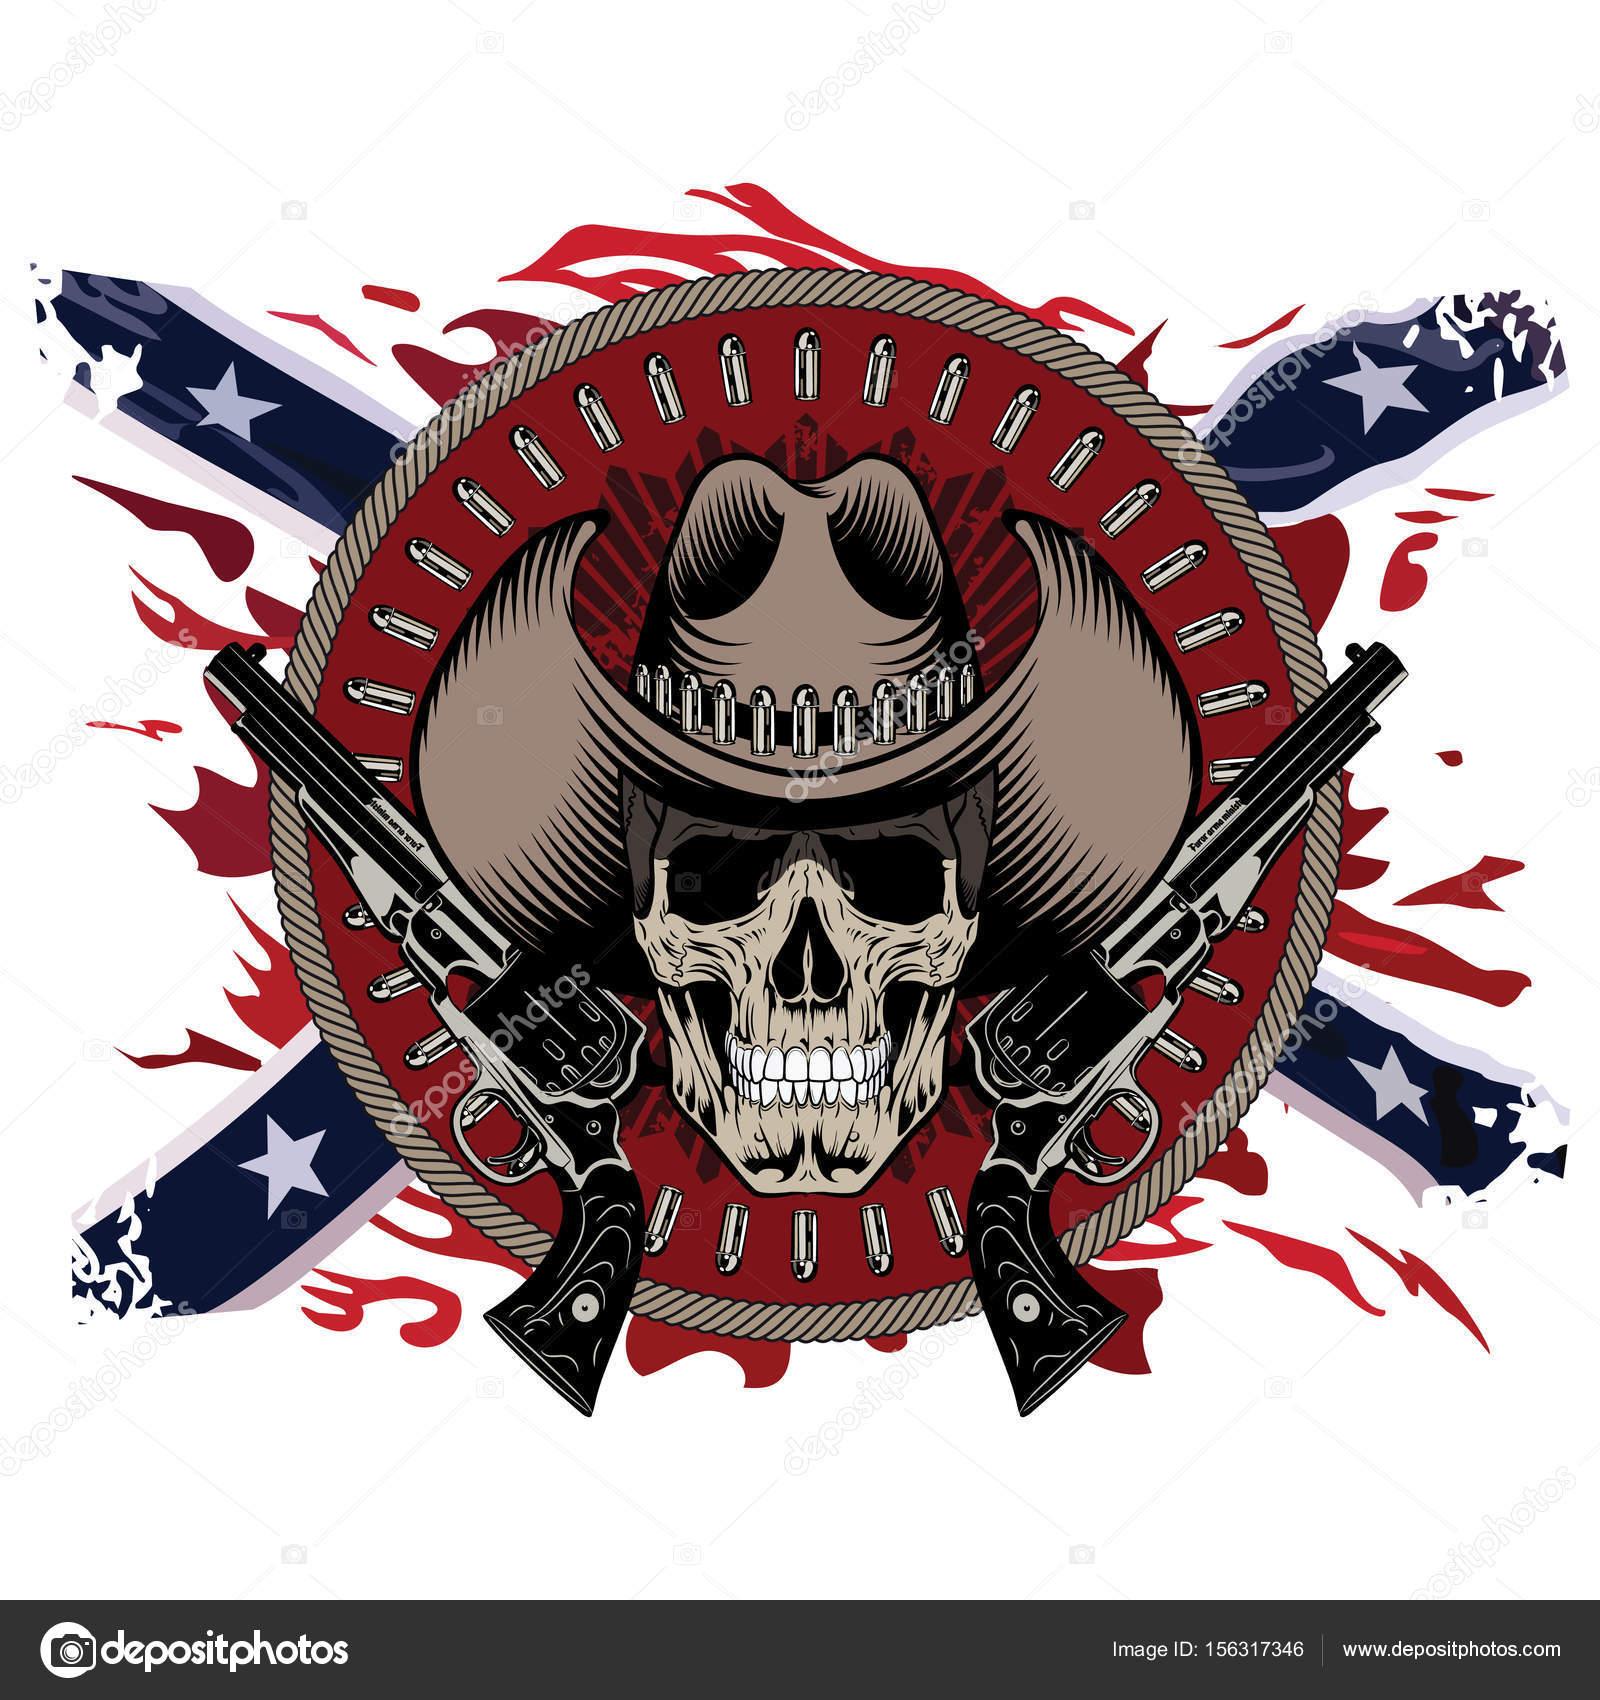 Design Gunfighter. Skull in cowboy hat 2e987817673